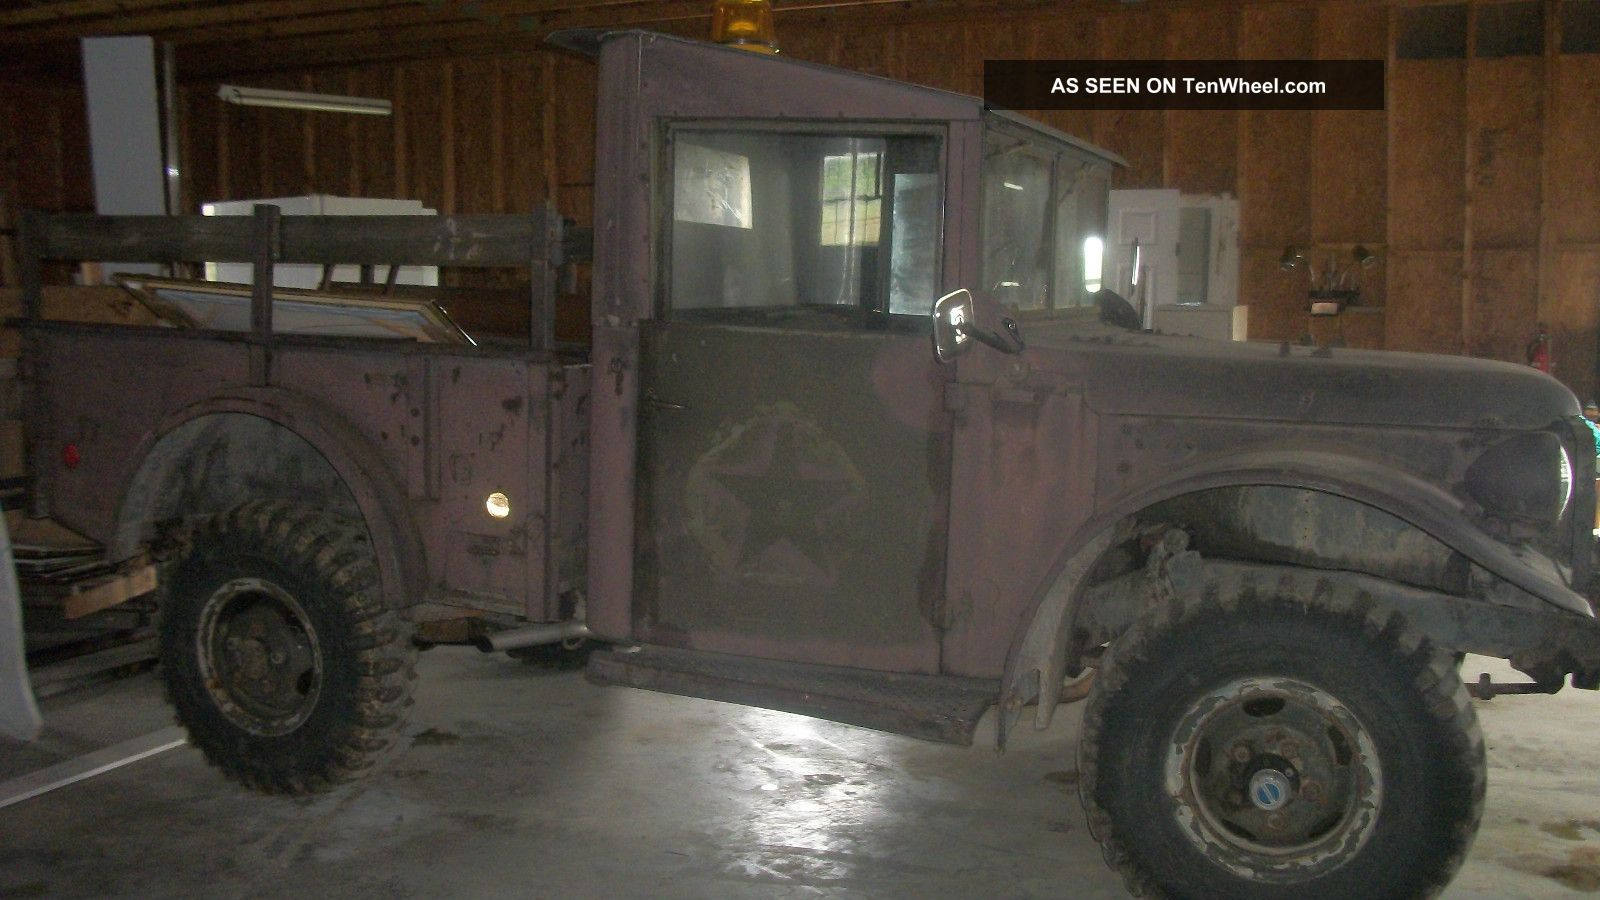 1954 Dodge M37 Power Wagon Troop Transport Vehicle Photo 1